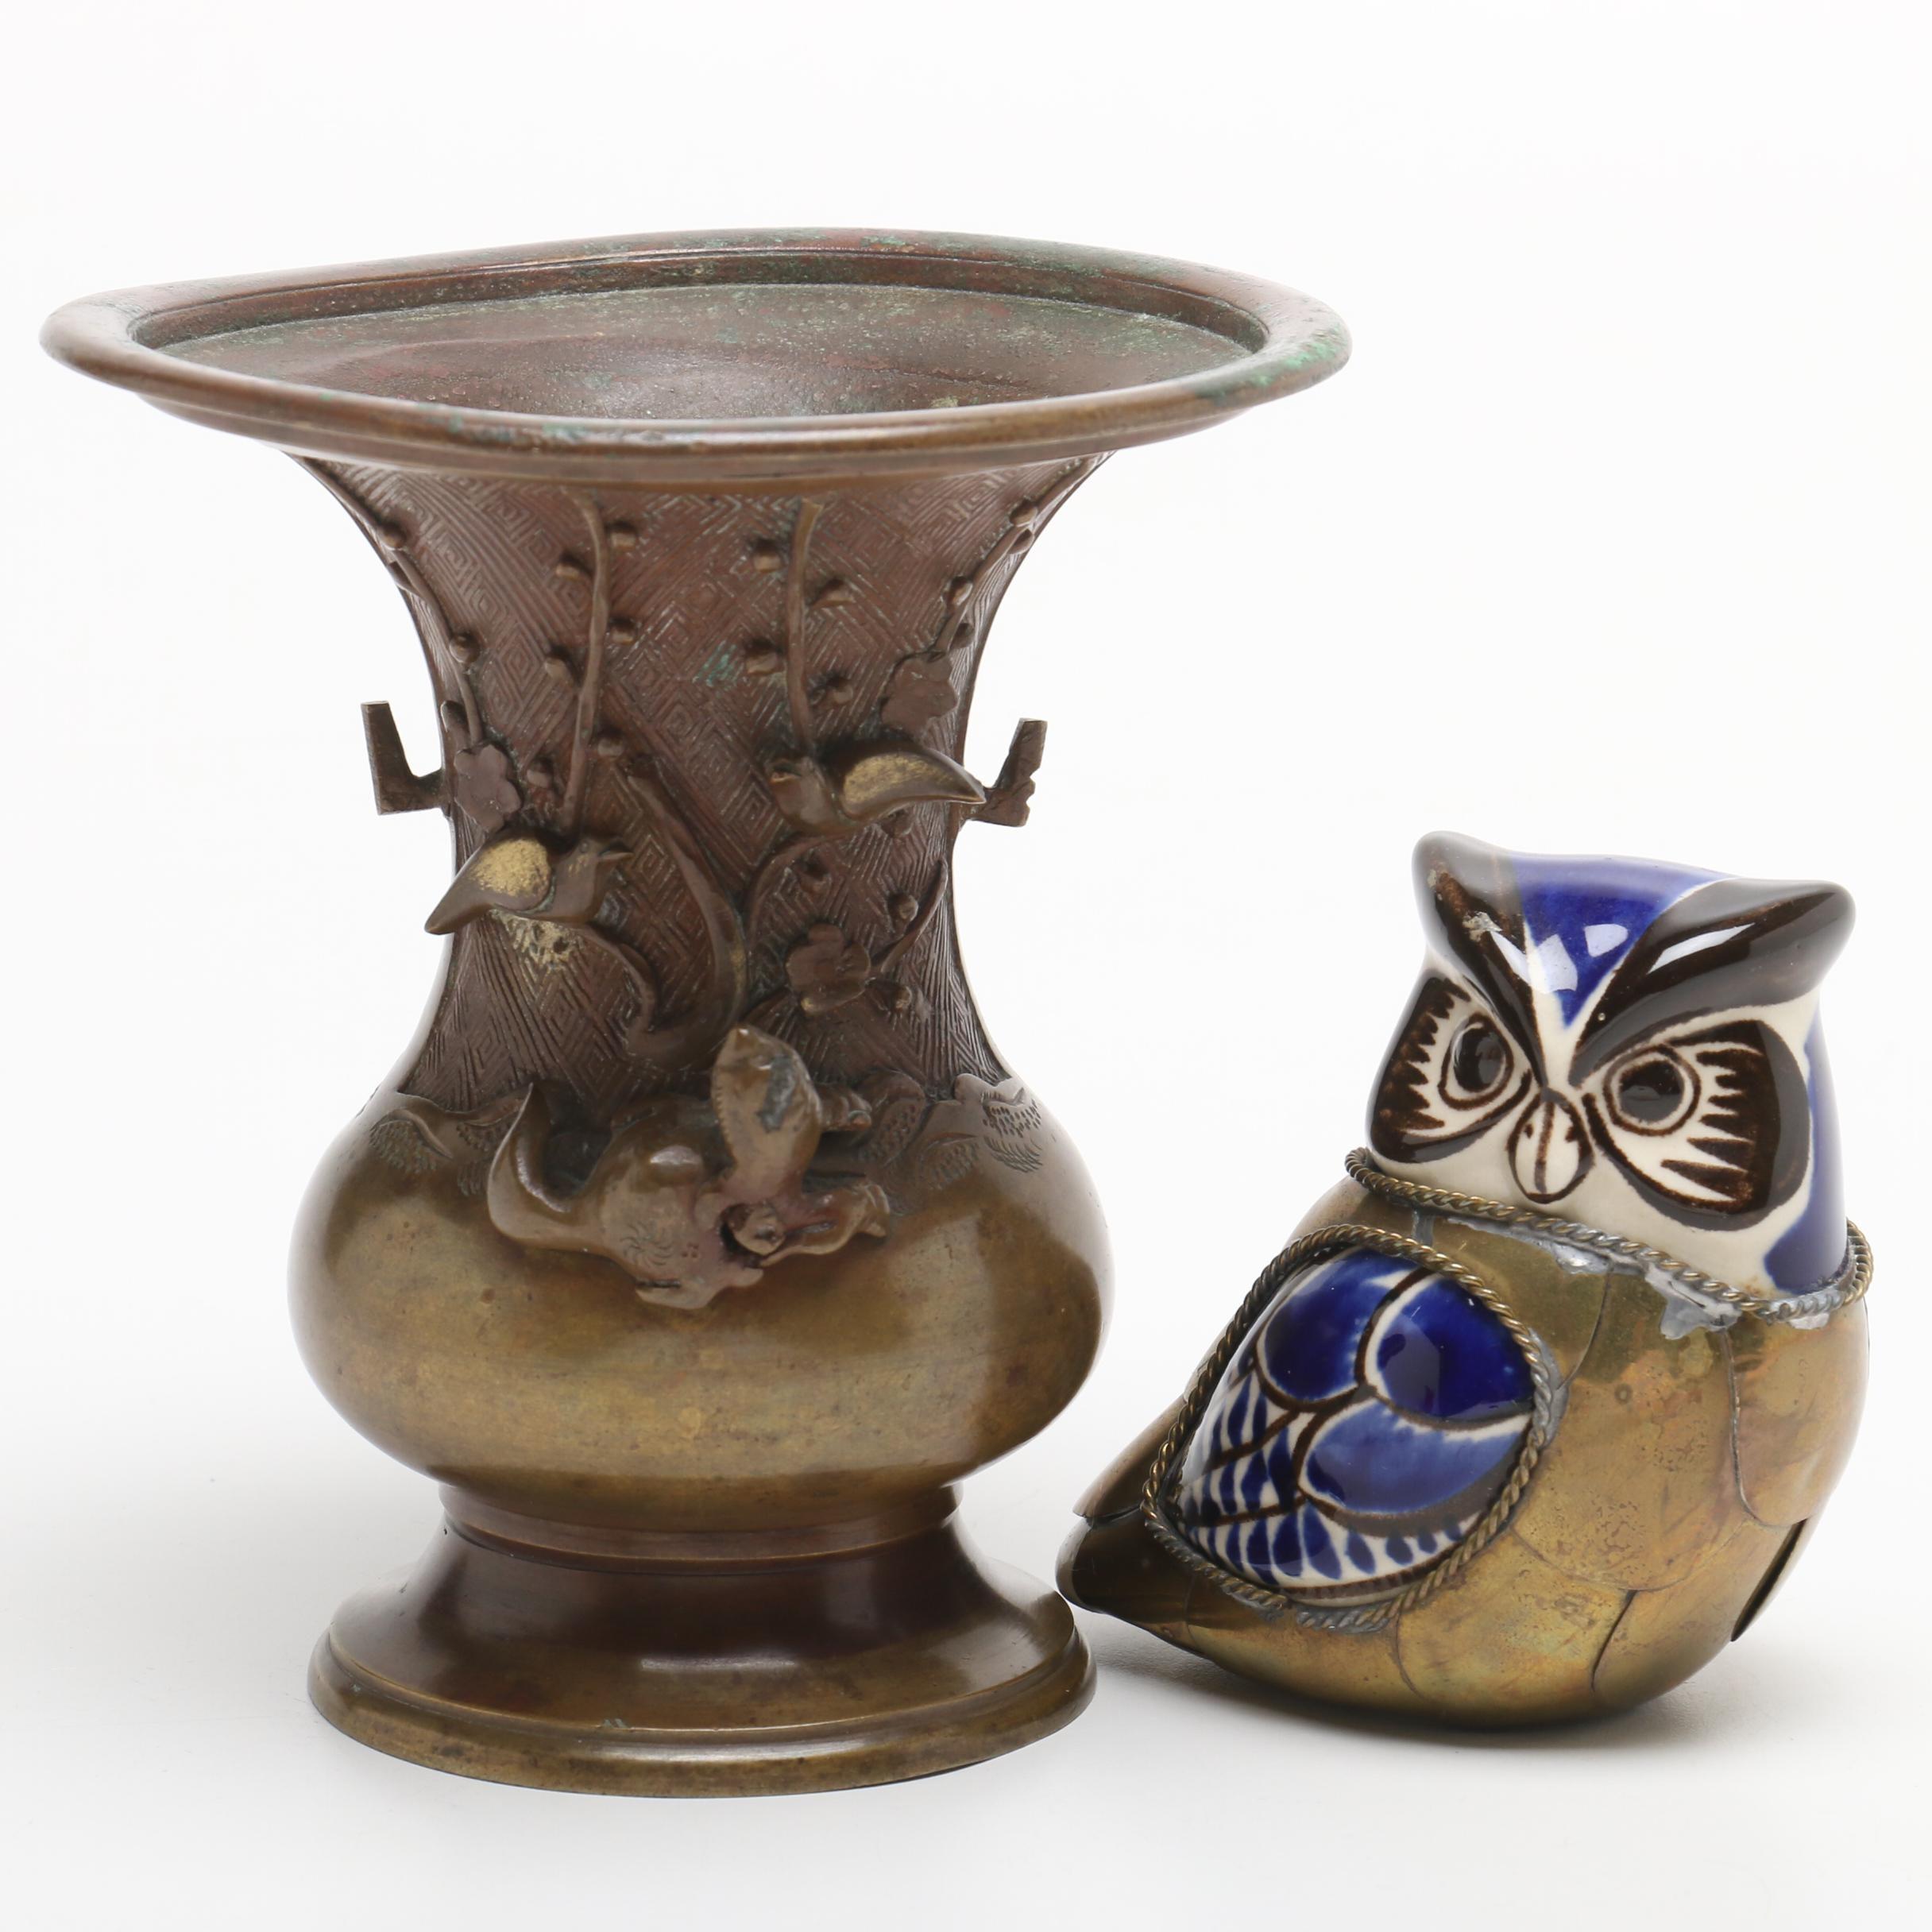 Japanese Brass Animal Motif Vase with Owl Figurine